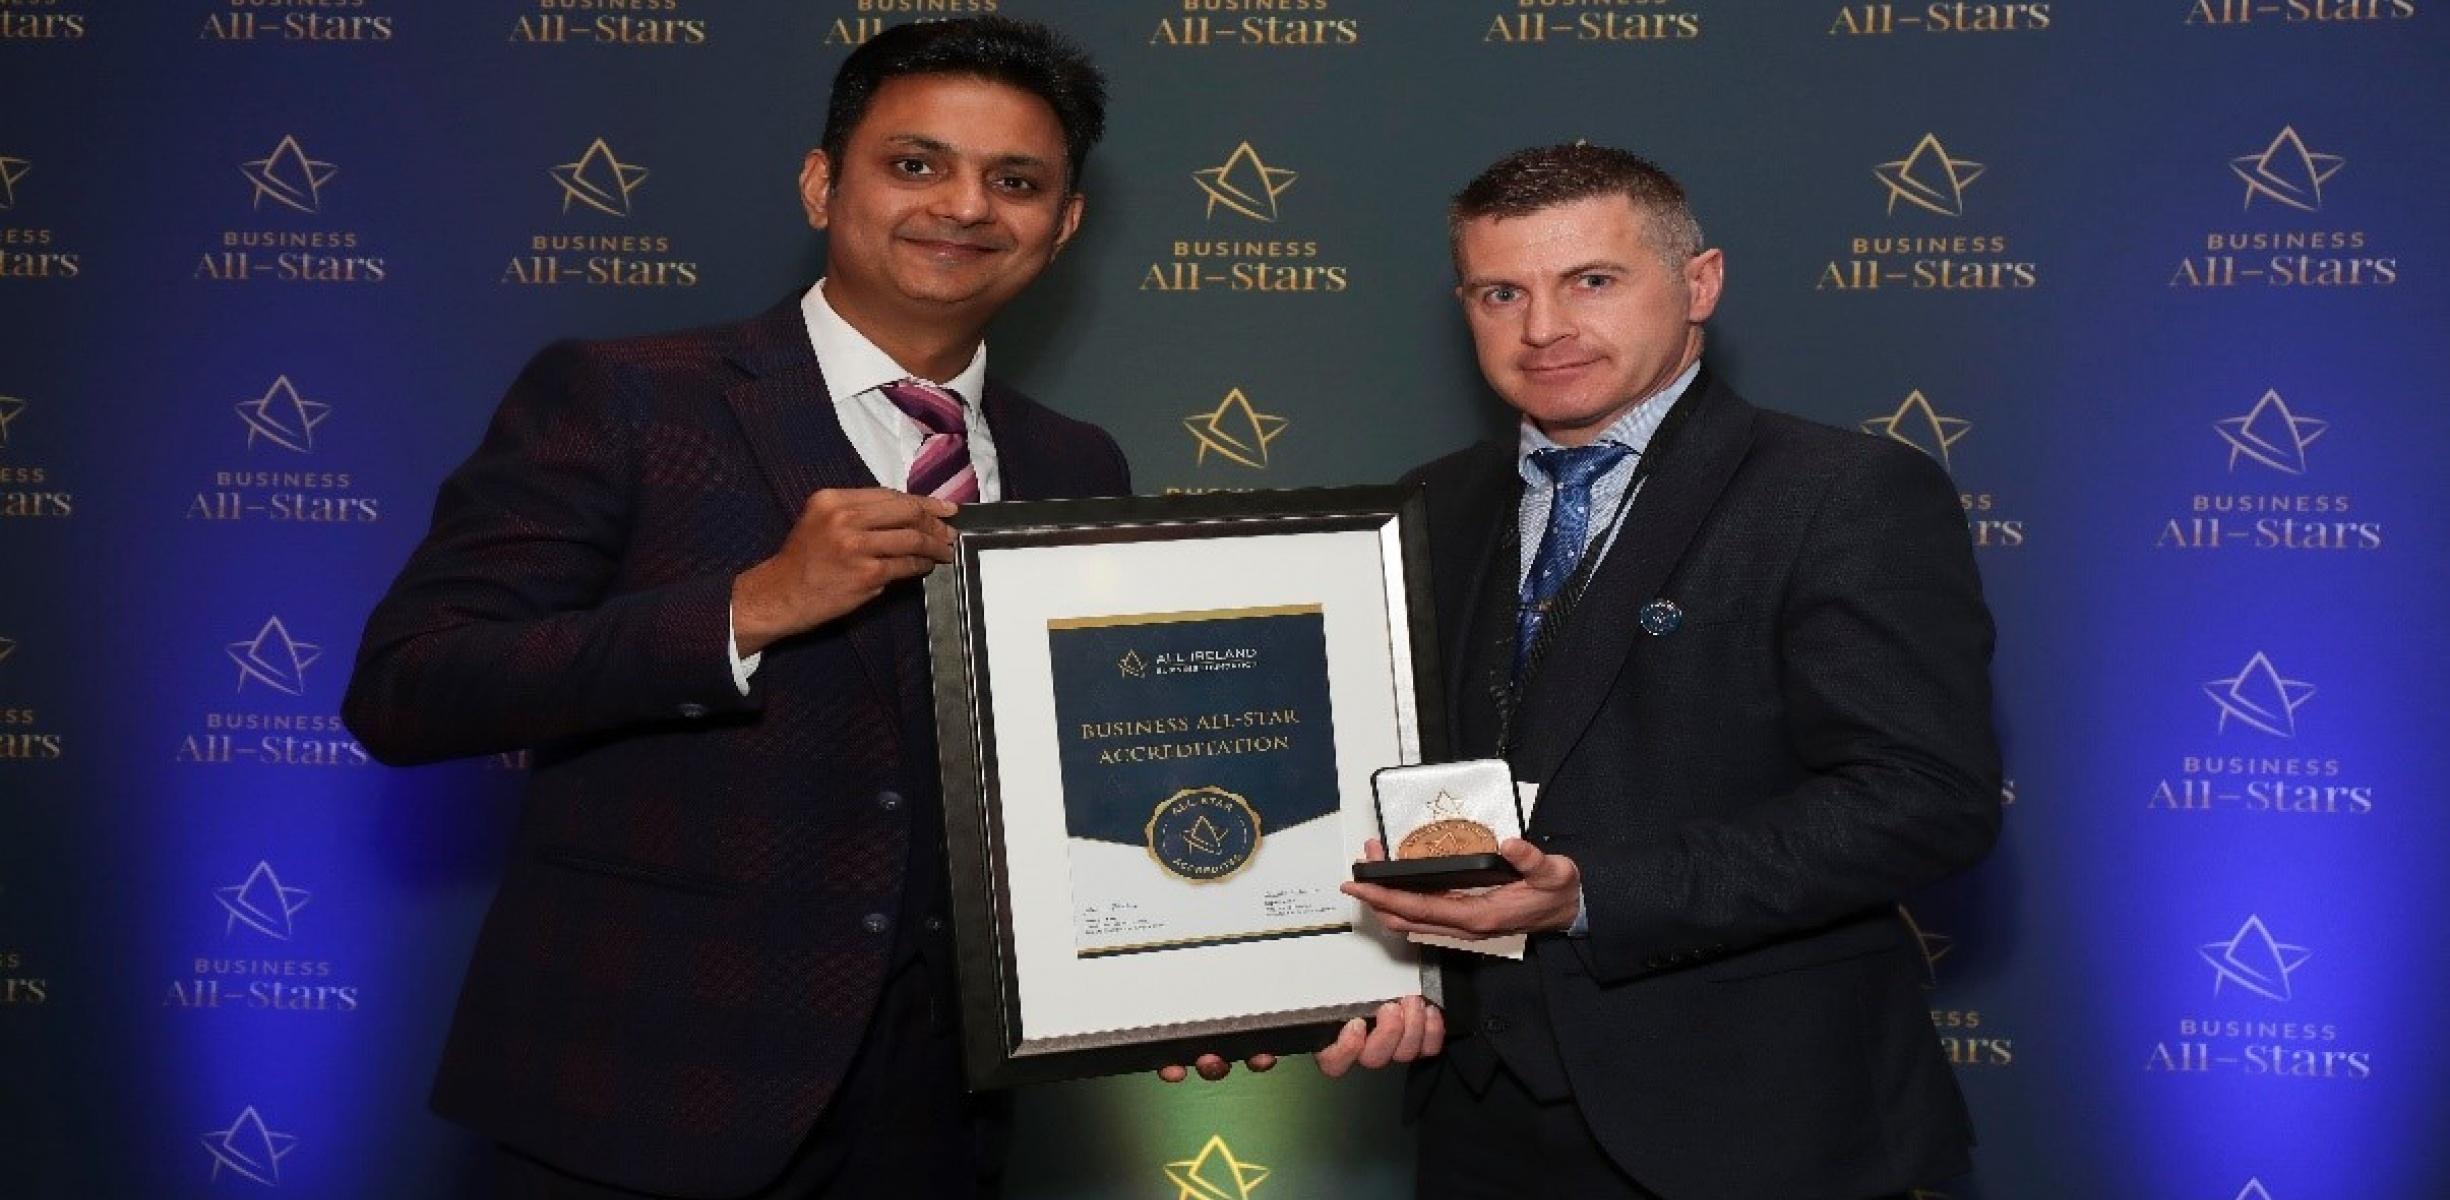 Community Finance Ireland All Stars Business Accreditation